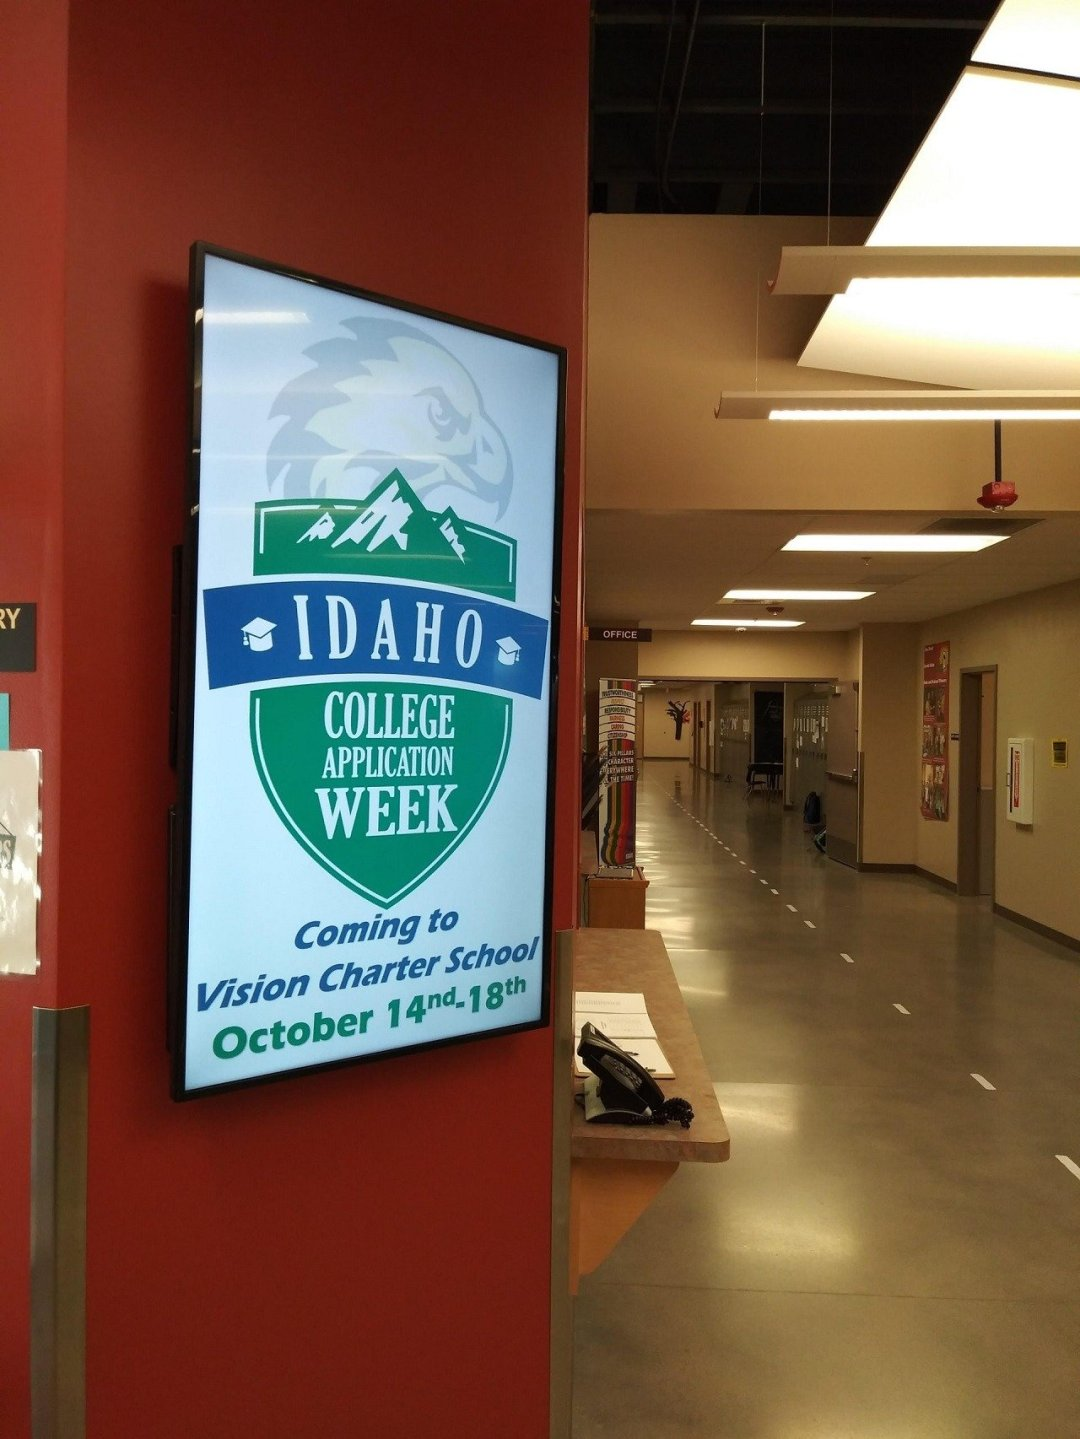 school information on digital signage displays